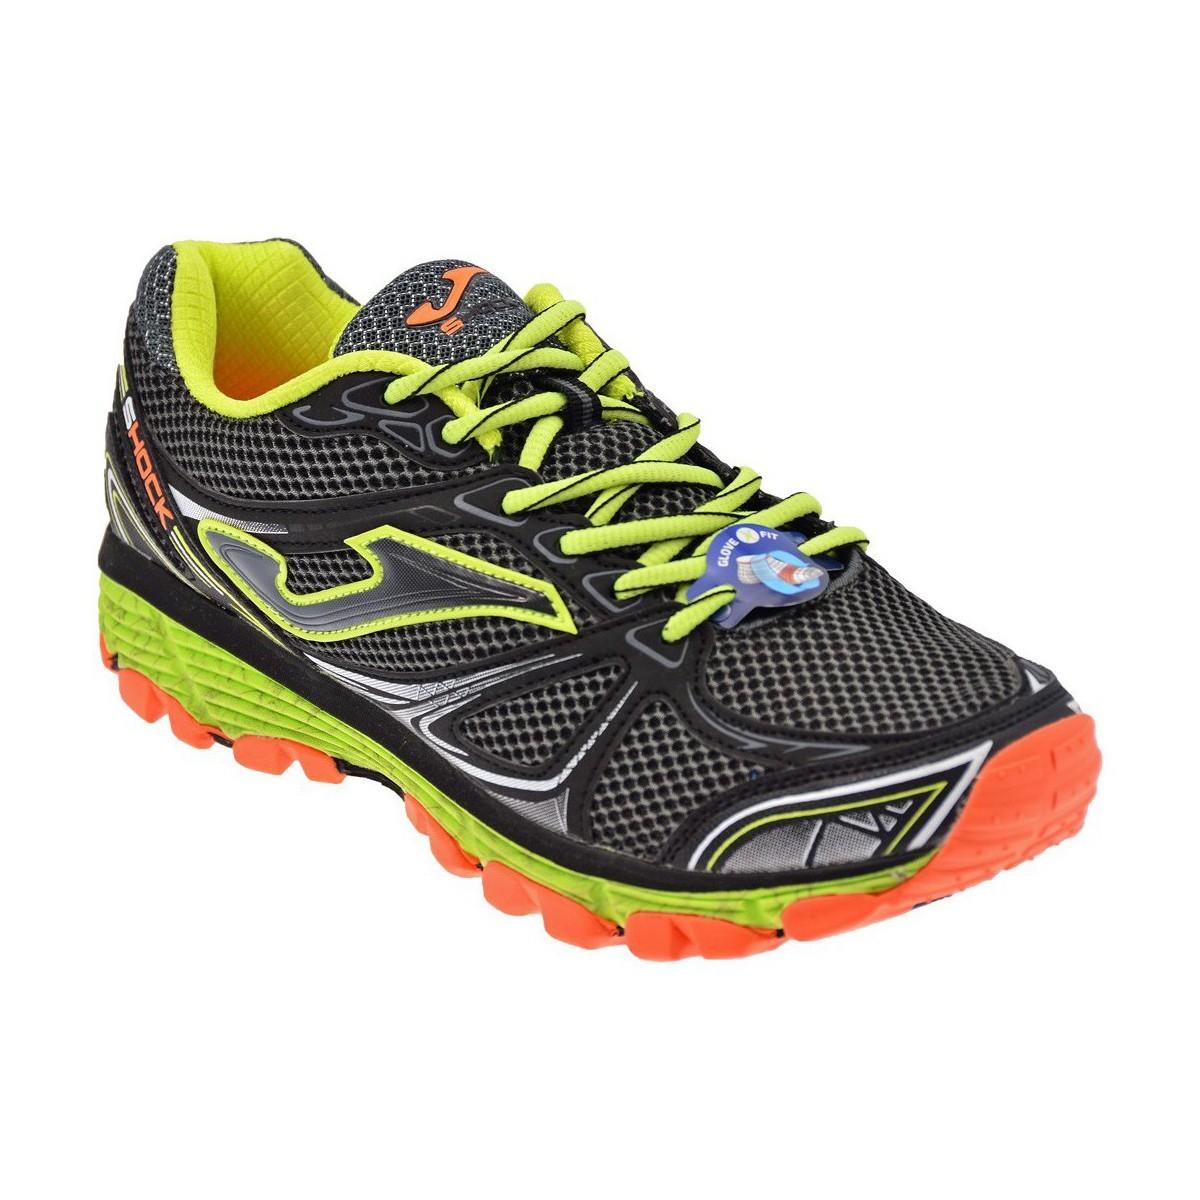 Tk Shock - scarpe trail running uomo - grigio fluo arancio ffb16cc54aa